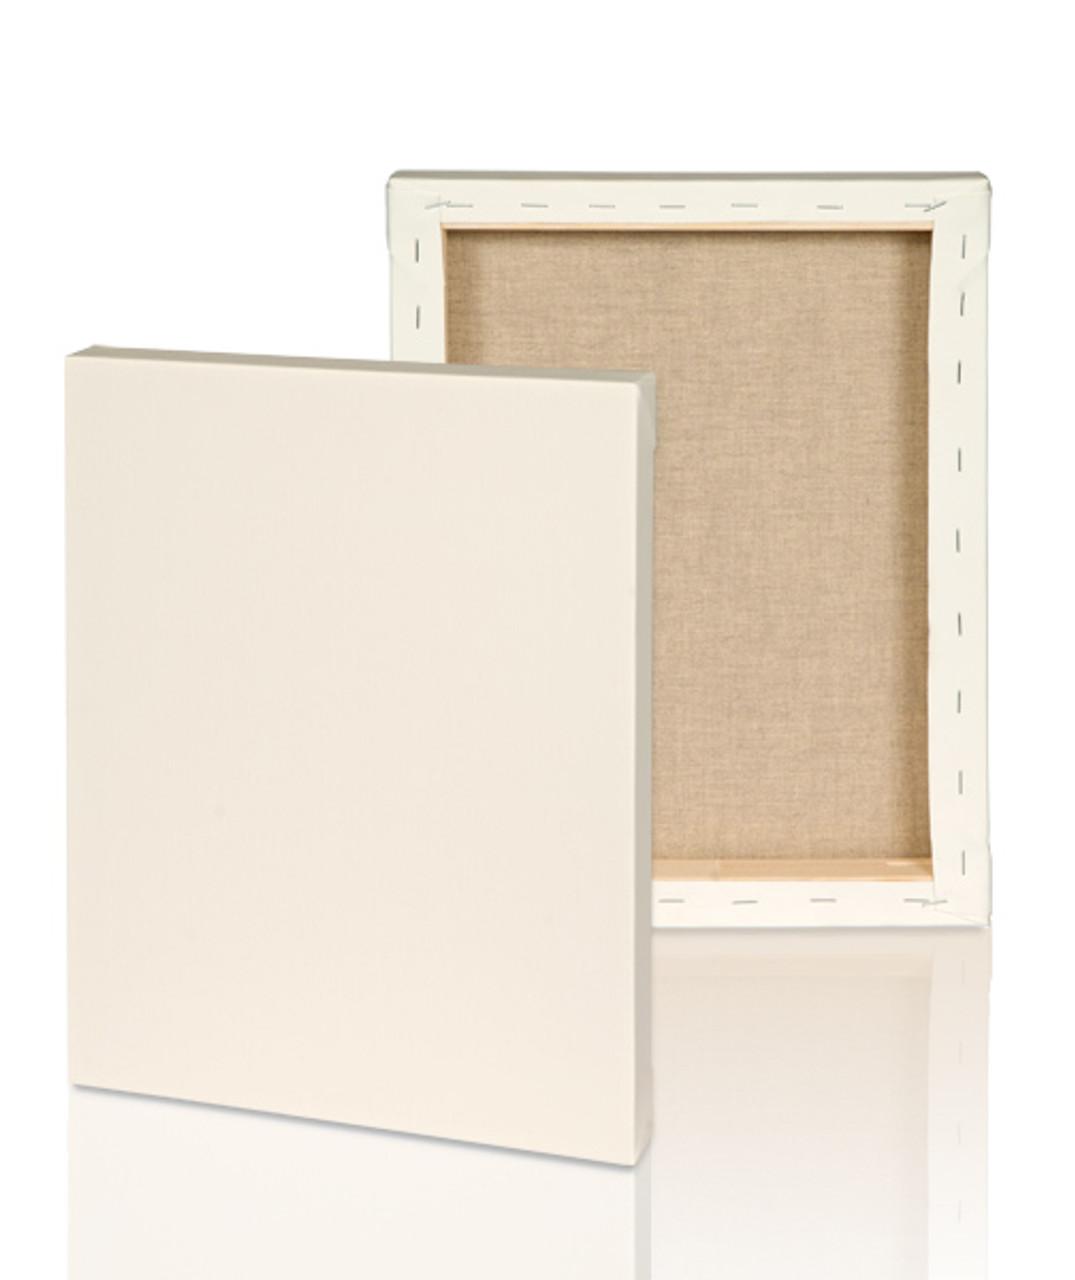 medium grain 3 4 stretched linen canvas 20x30 single piece